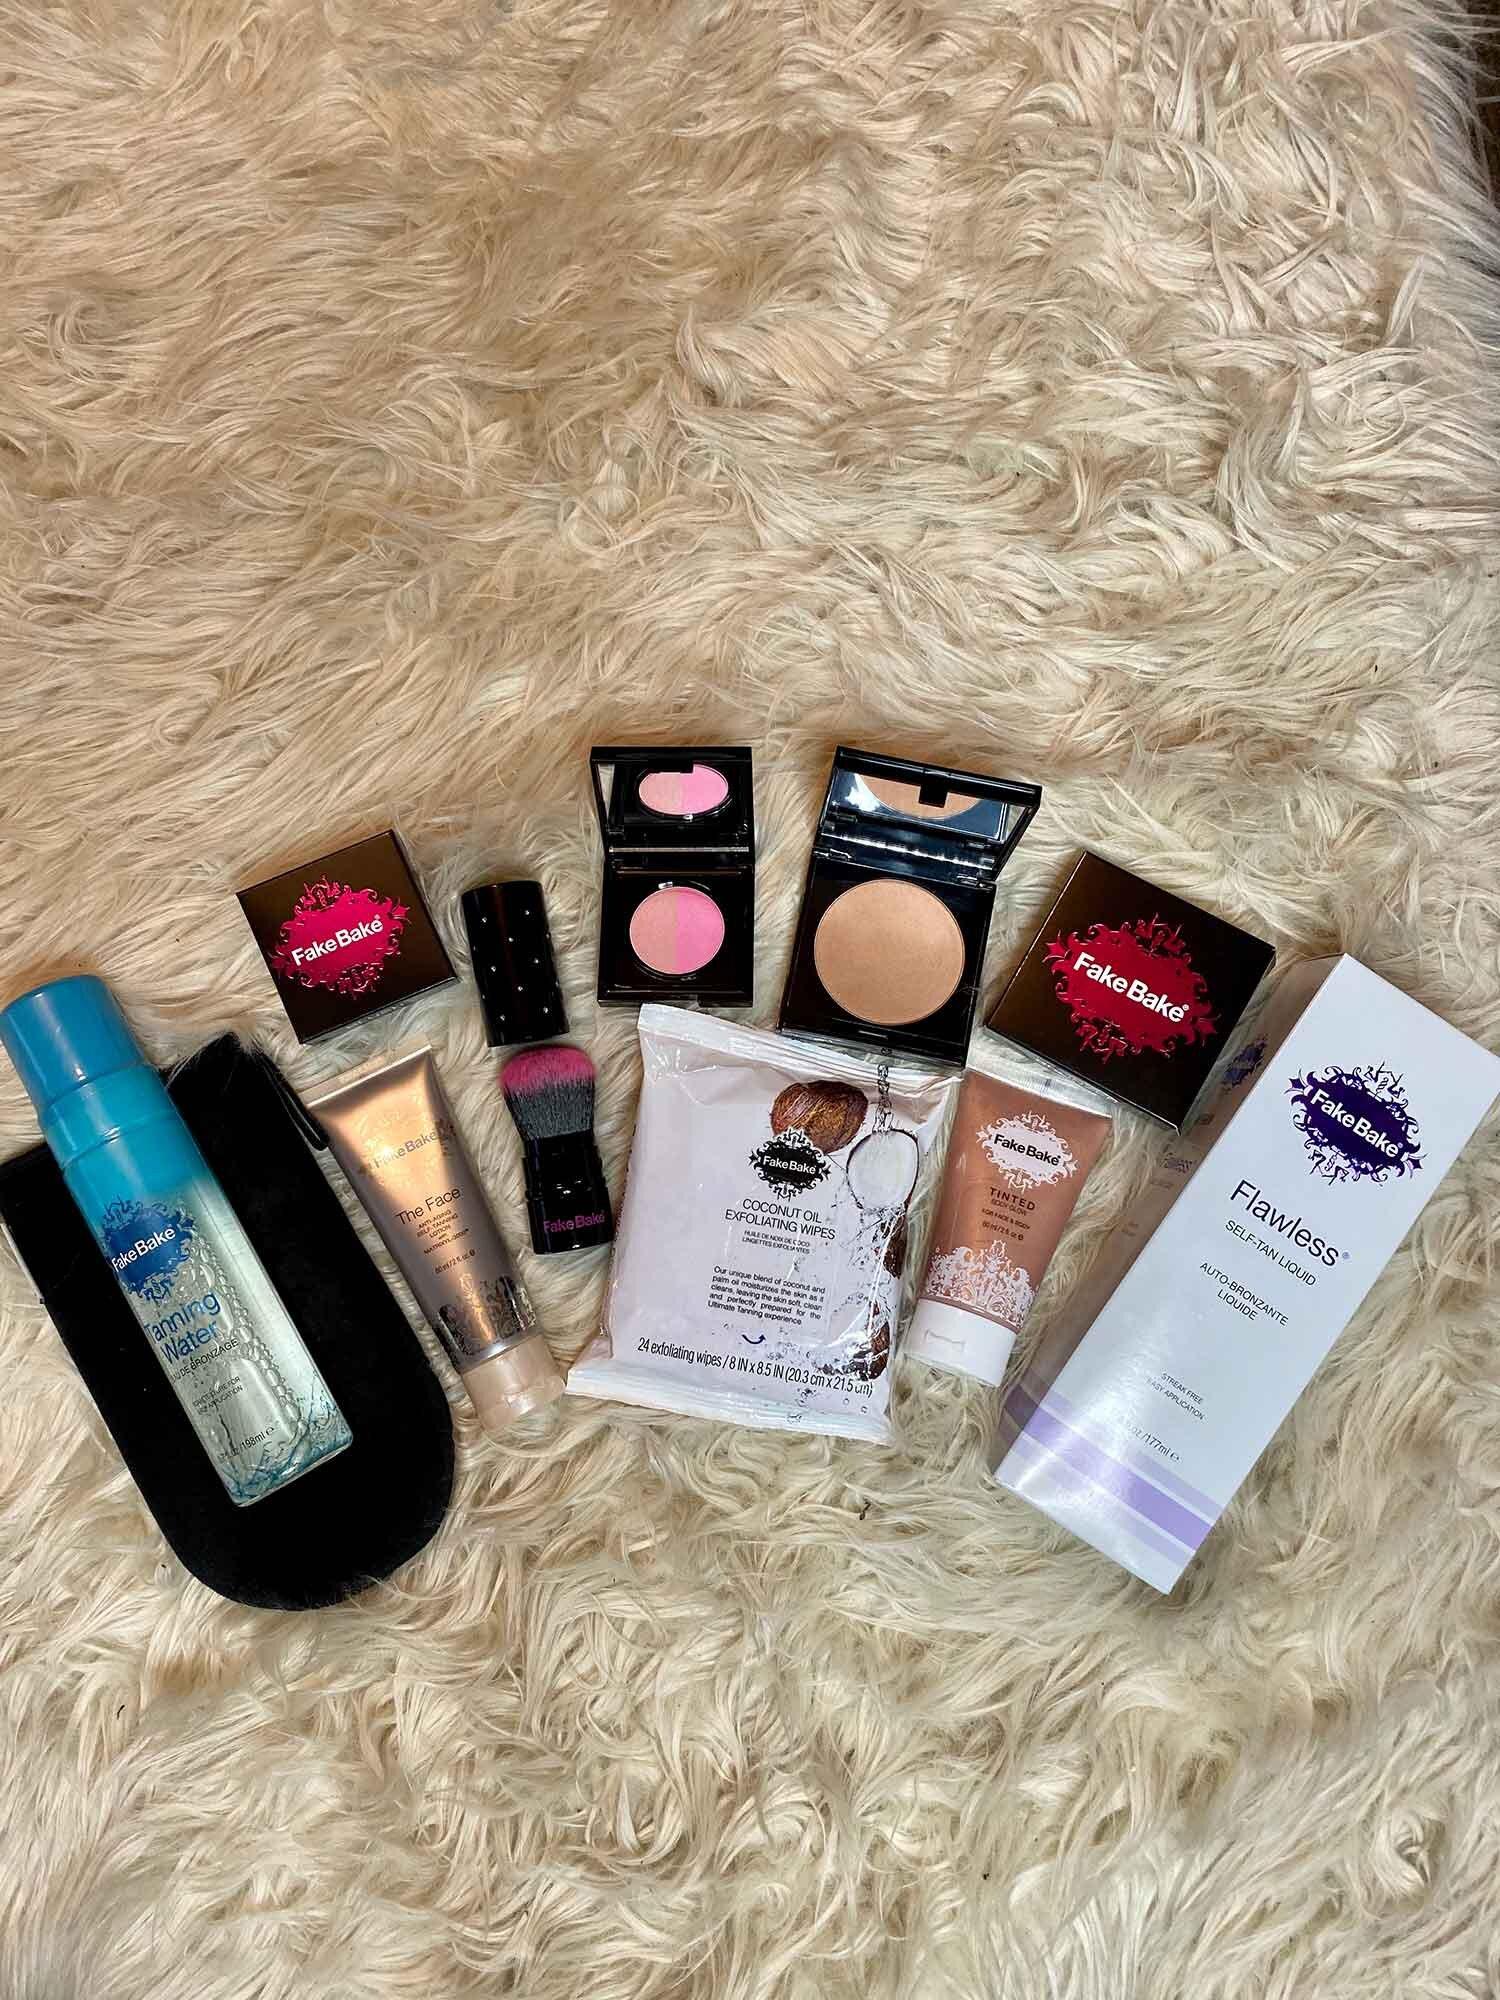 Fake Bake self tanning beauty gift set